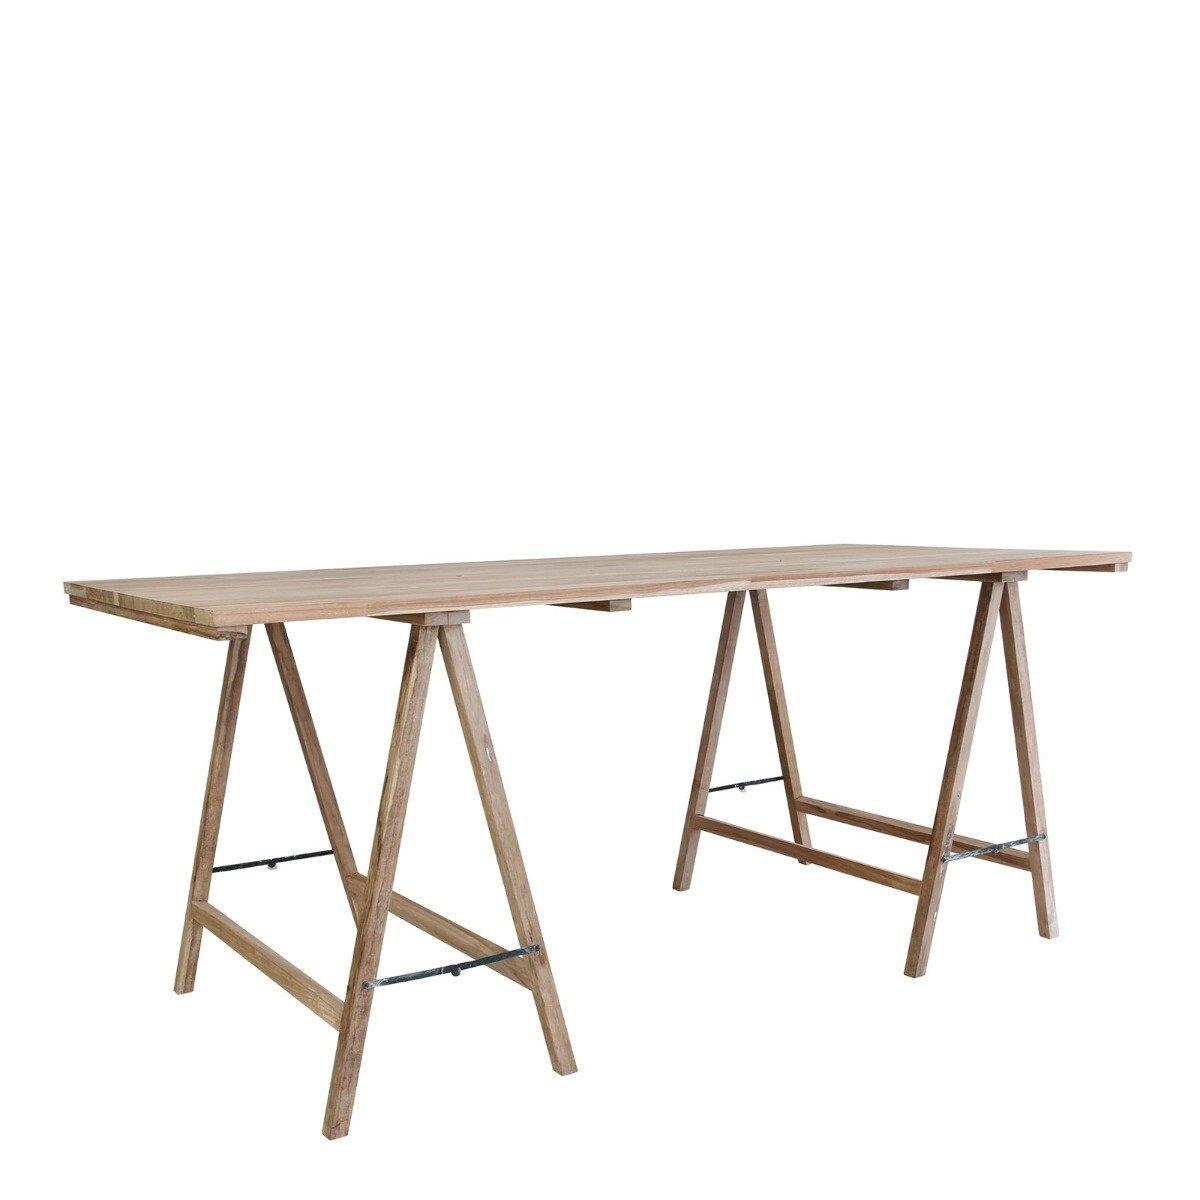 HKliving tafel teak hout 76 x 180 x 80